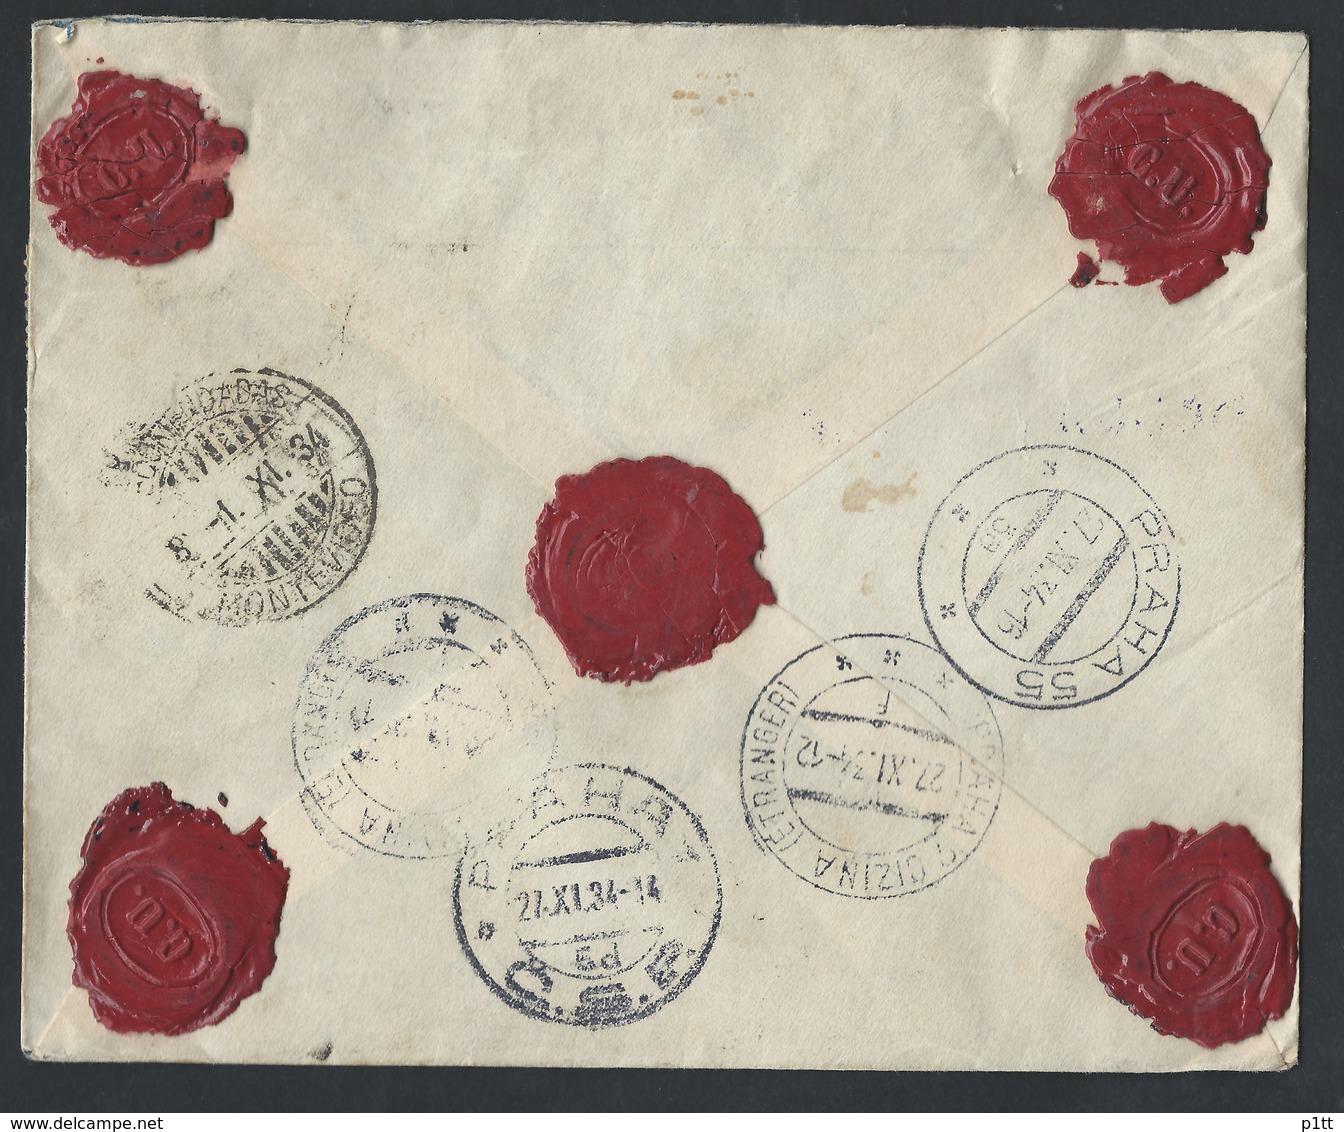 1URUInternational Registered Valuable Closed Letter. Post Office 1934 Montevideo (Uruguay) Prague (Czechoslovakia). - Czechoslovakia